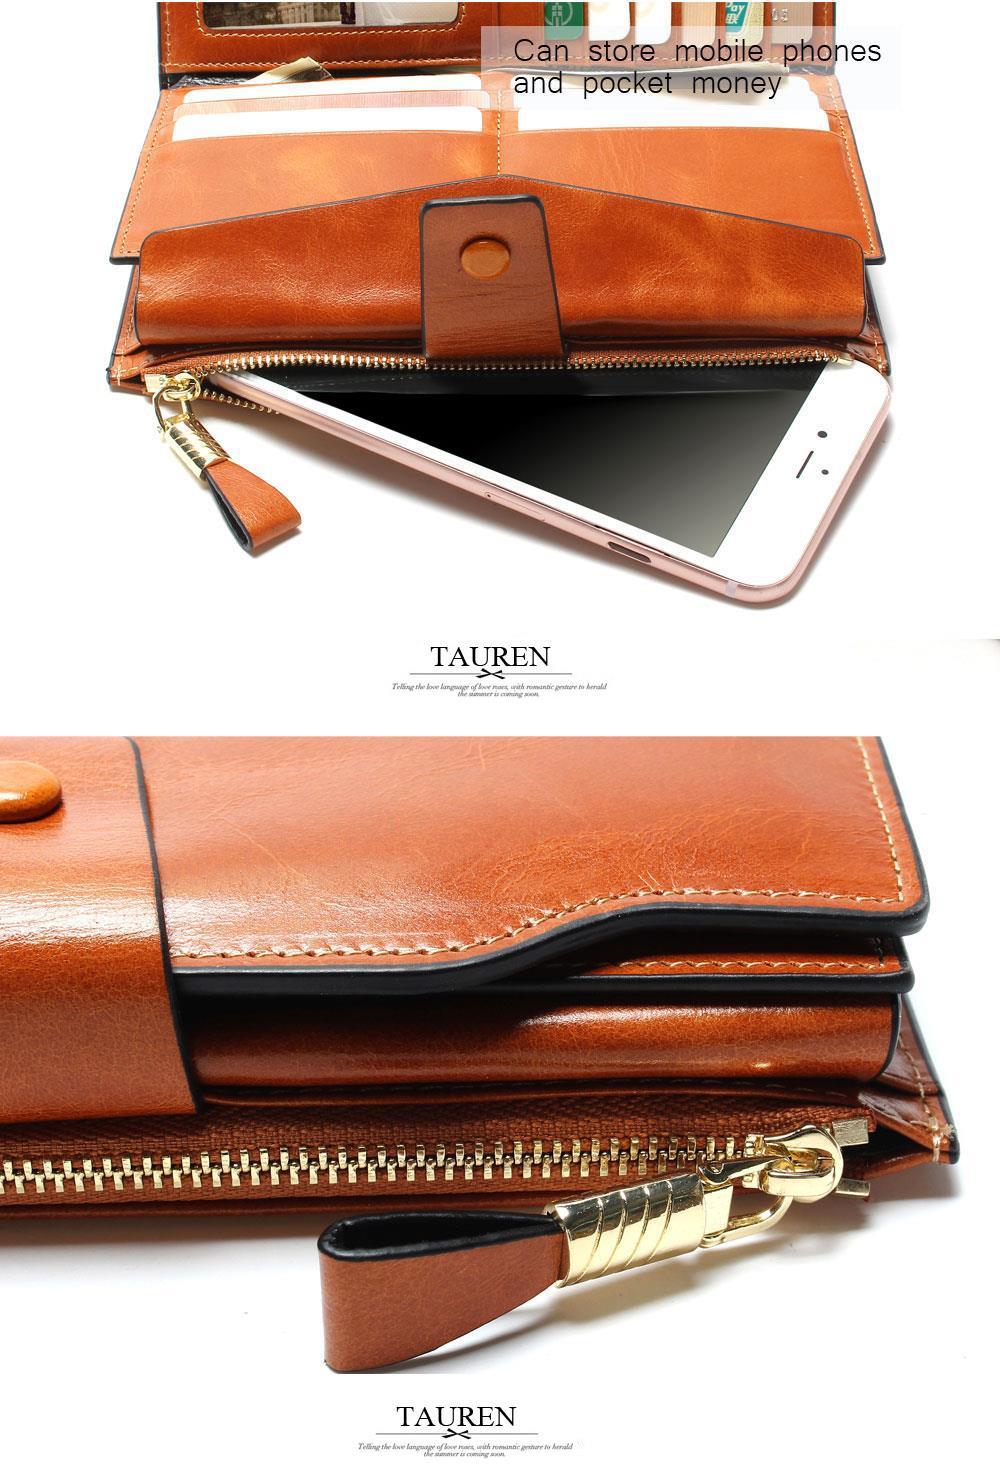 HTB1psrIOVXXXXcRaXXXq6xXFXXXv - 2018 New Design Fashion Multifunctional Purse Genuine Leather Wallet Women Long Style Cowhide Purse Wholesale And Retail Bag